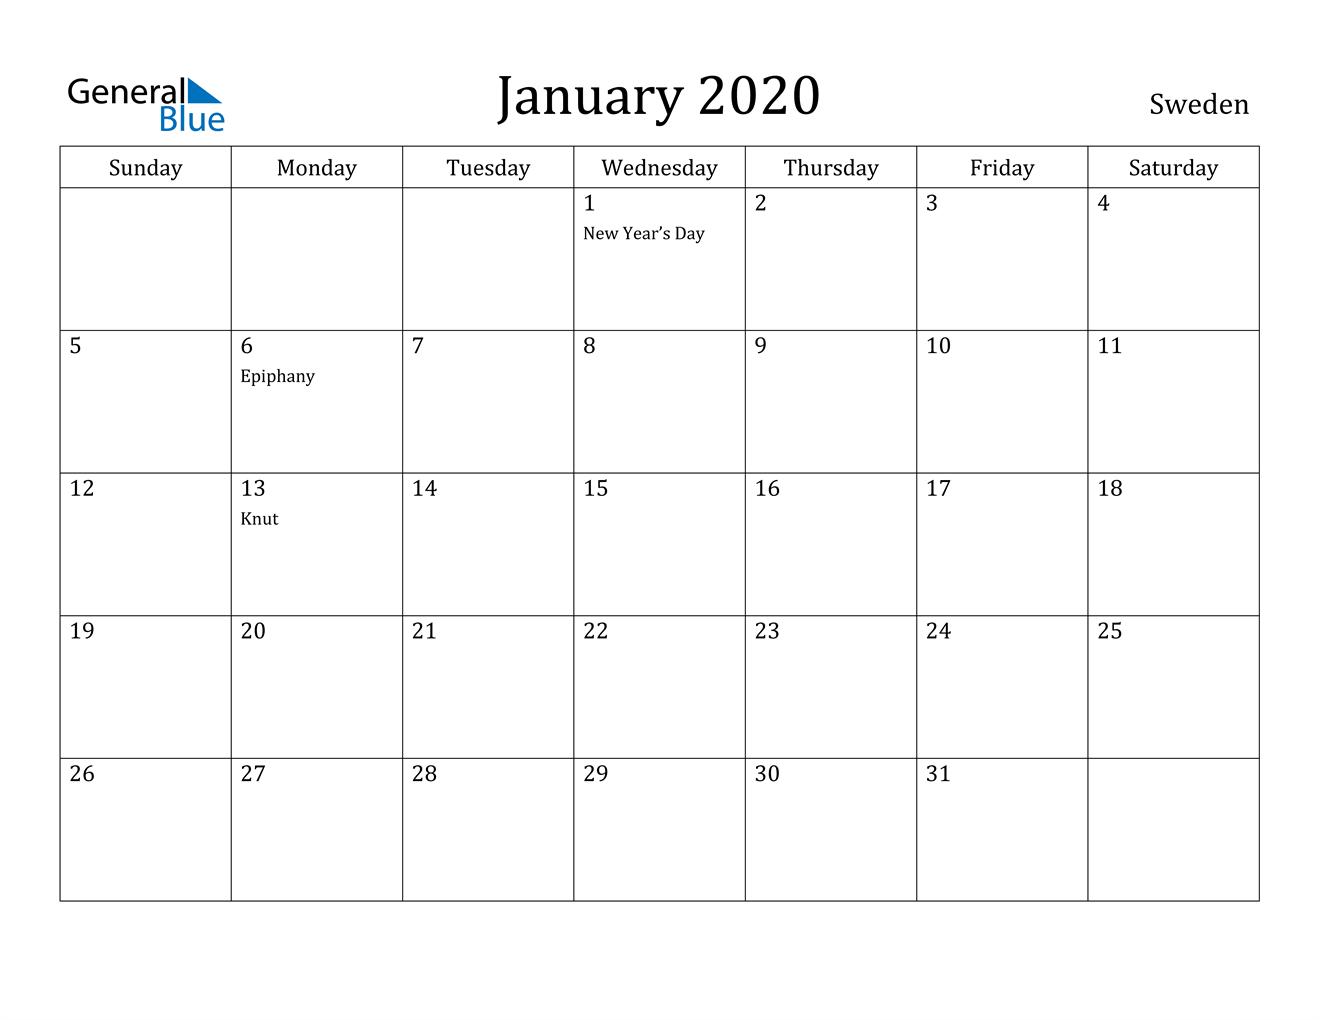 Image of January 2020 Sweden Calendar with Holidays Calendar